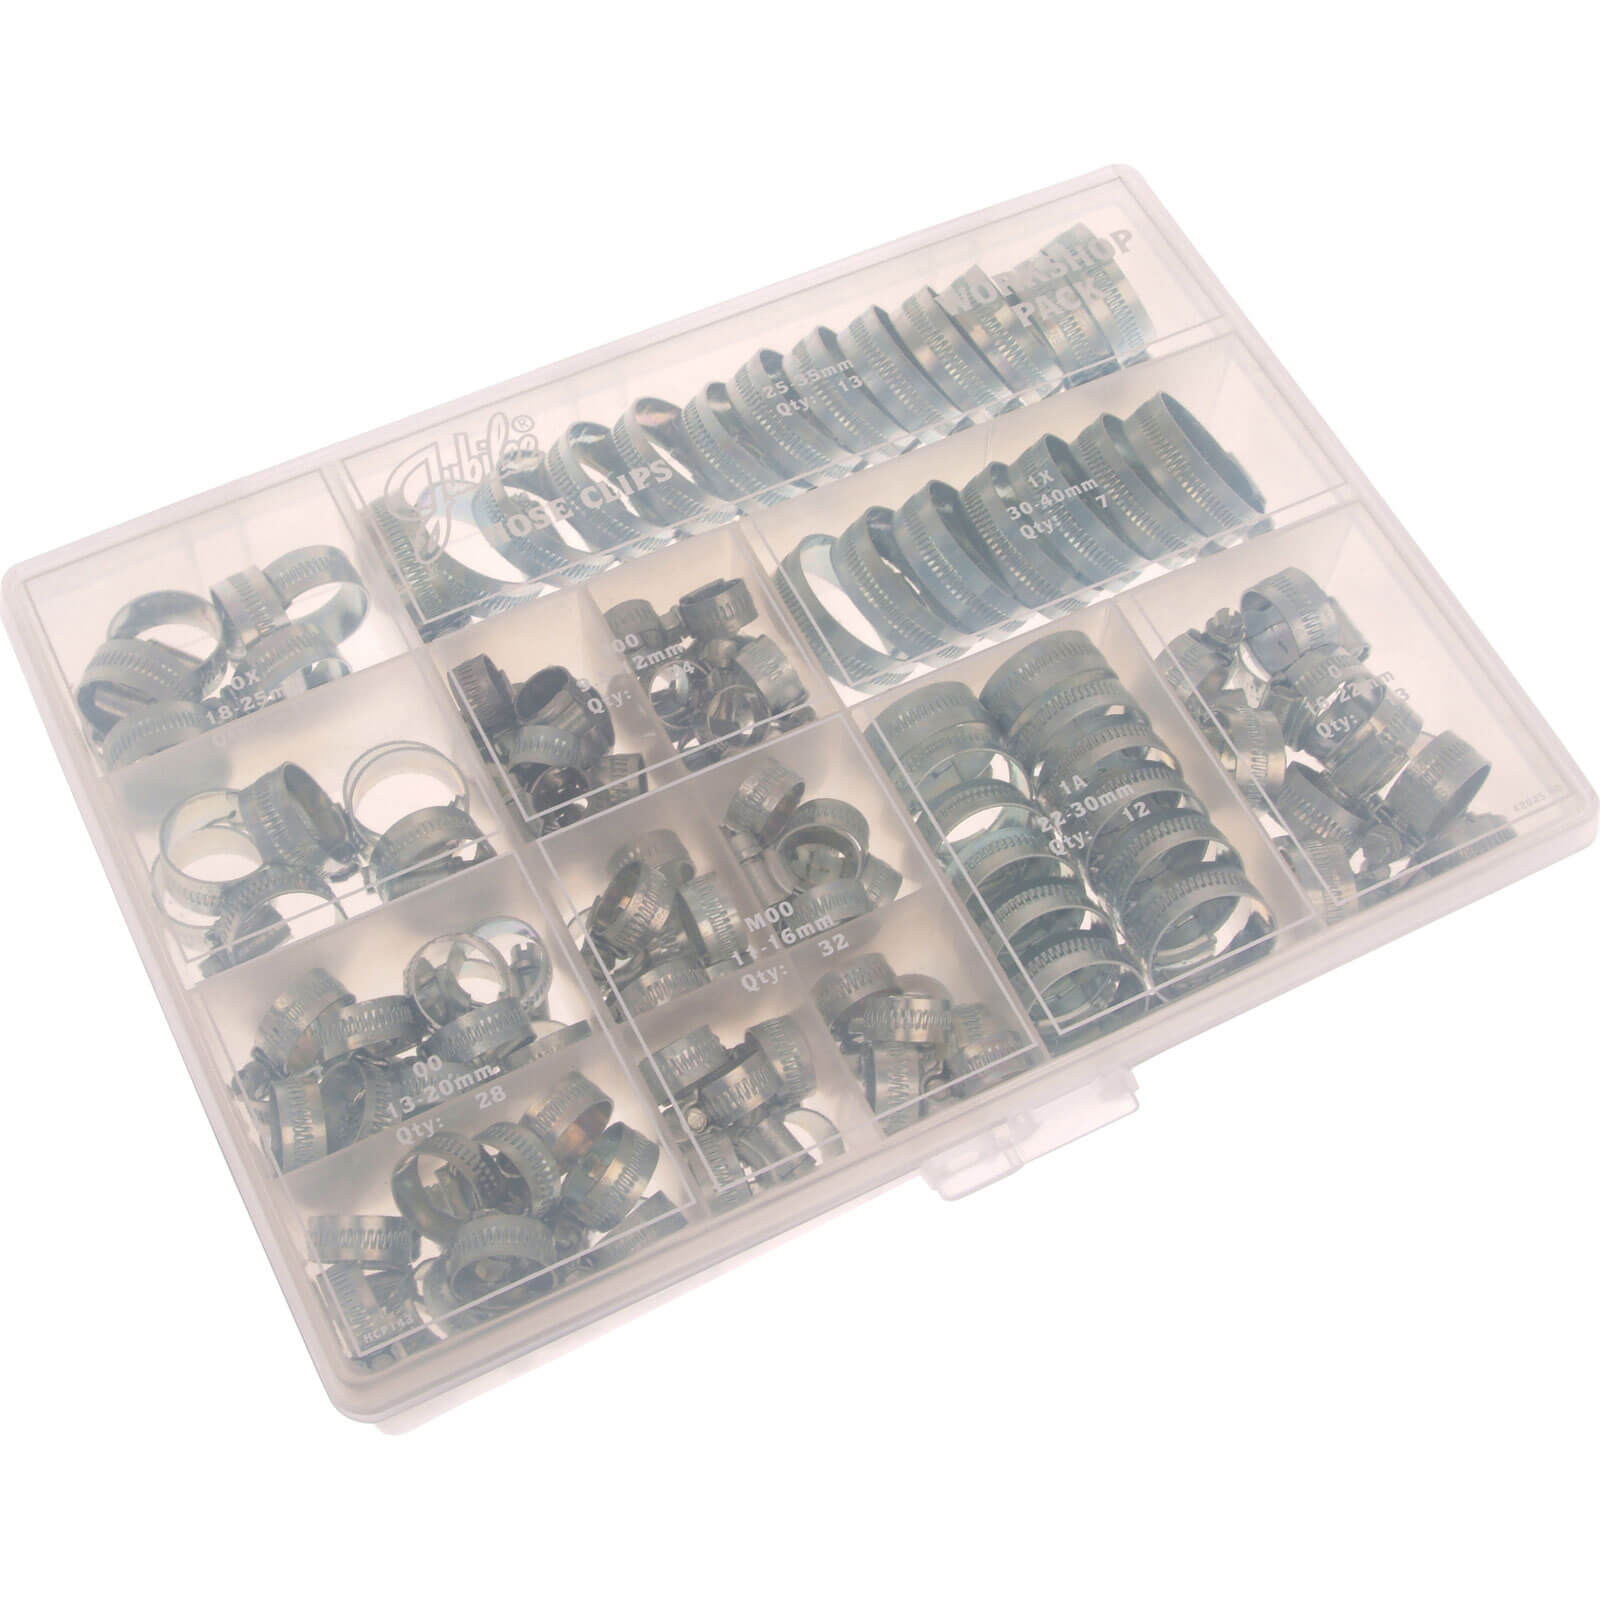 Image of Jubilee 143 Piece Zinc Plated Hose Clip Assortment Set